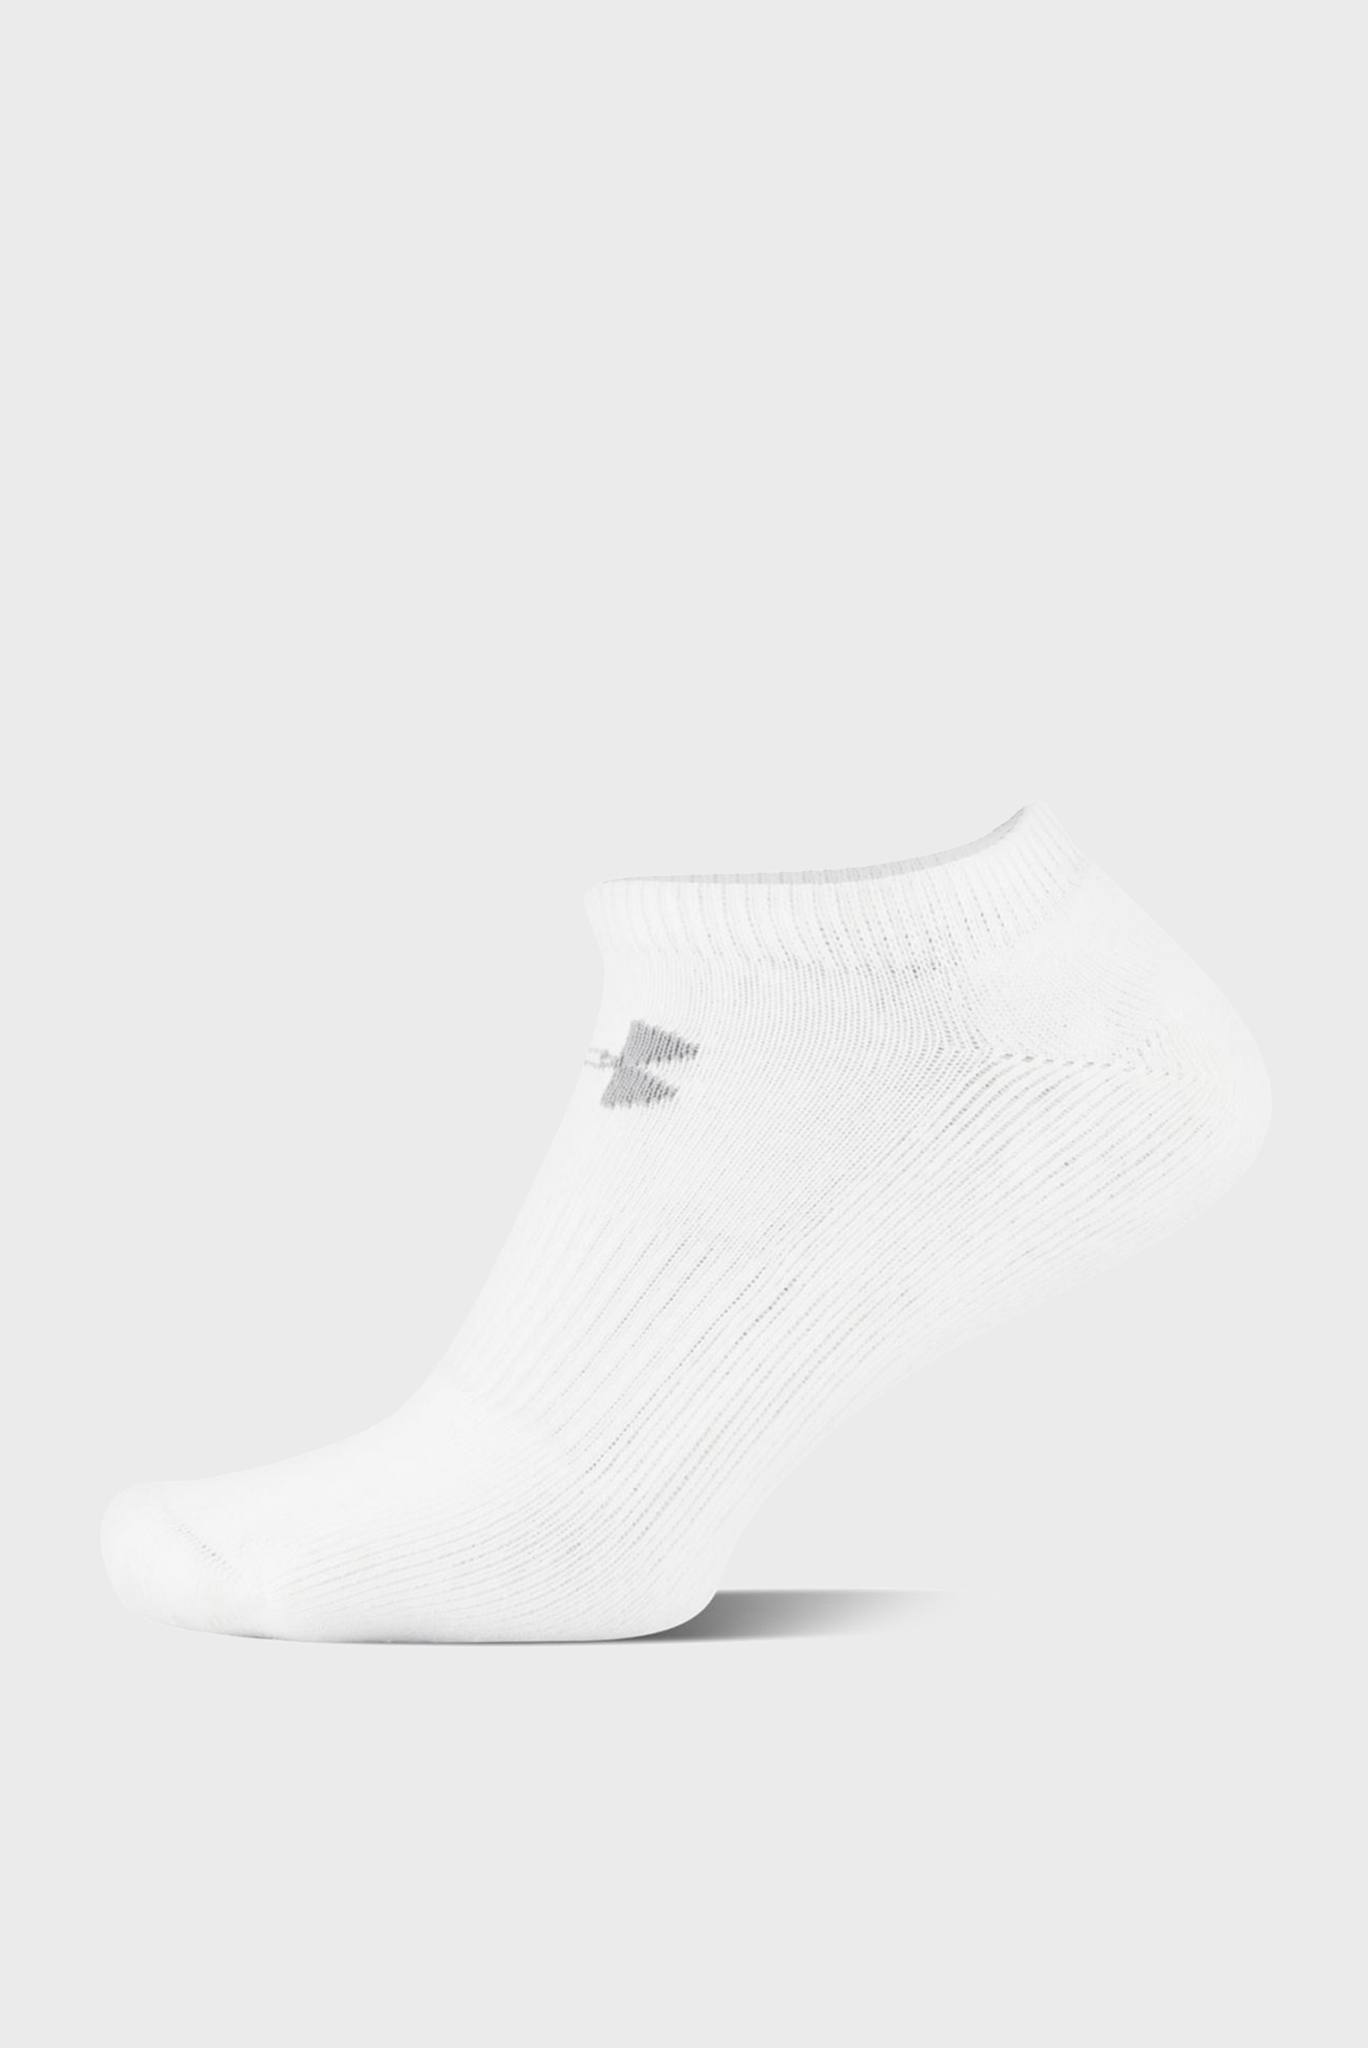 Мужские белые носки (6 пар) CHARGED COTTON 2.0 NOSHOW Under Armour